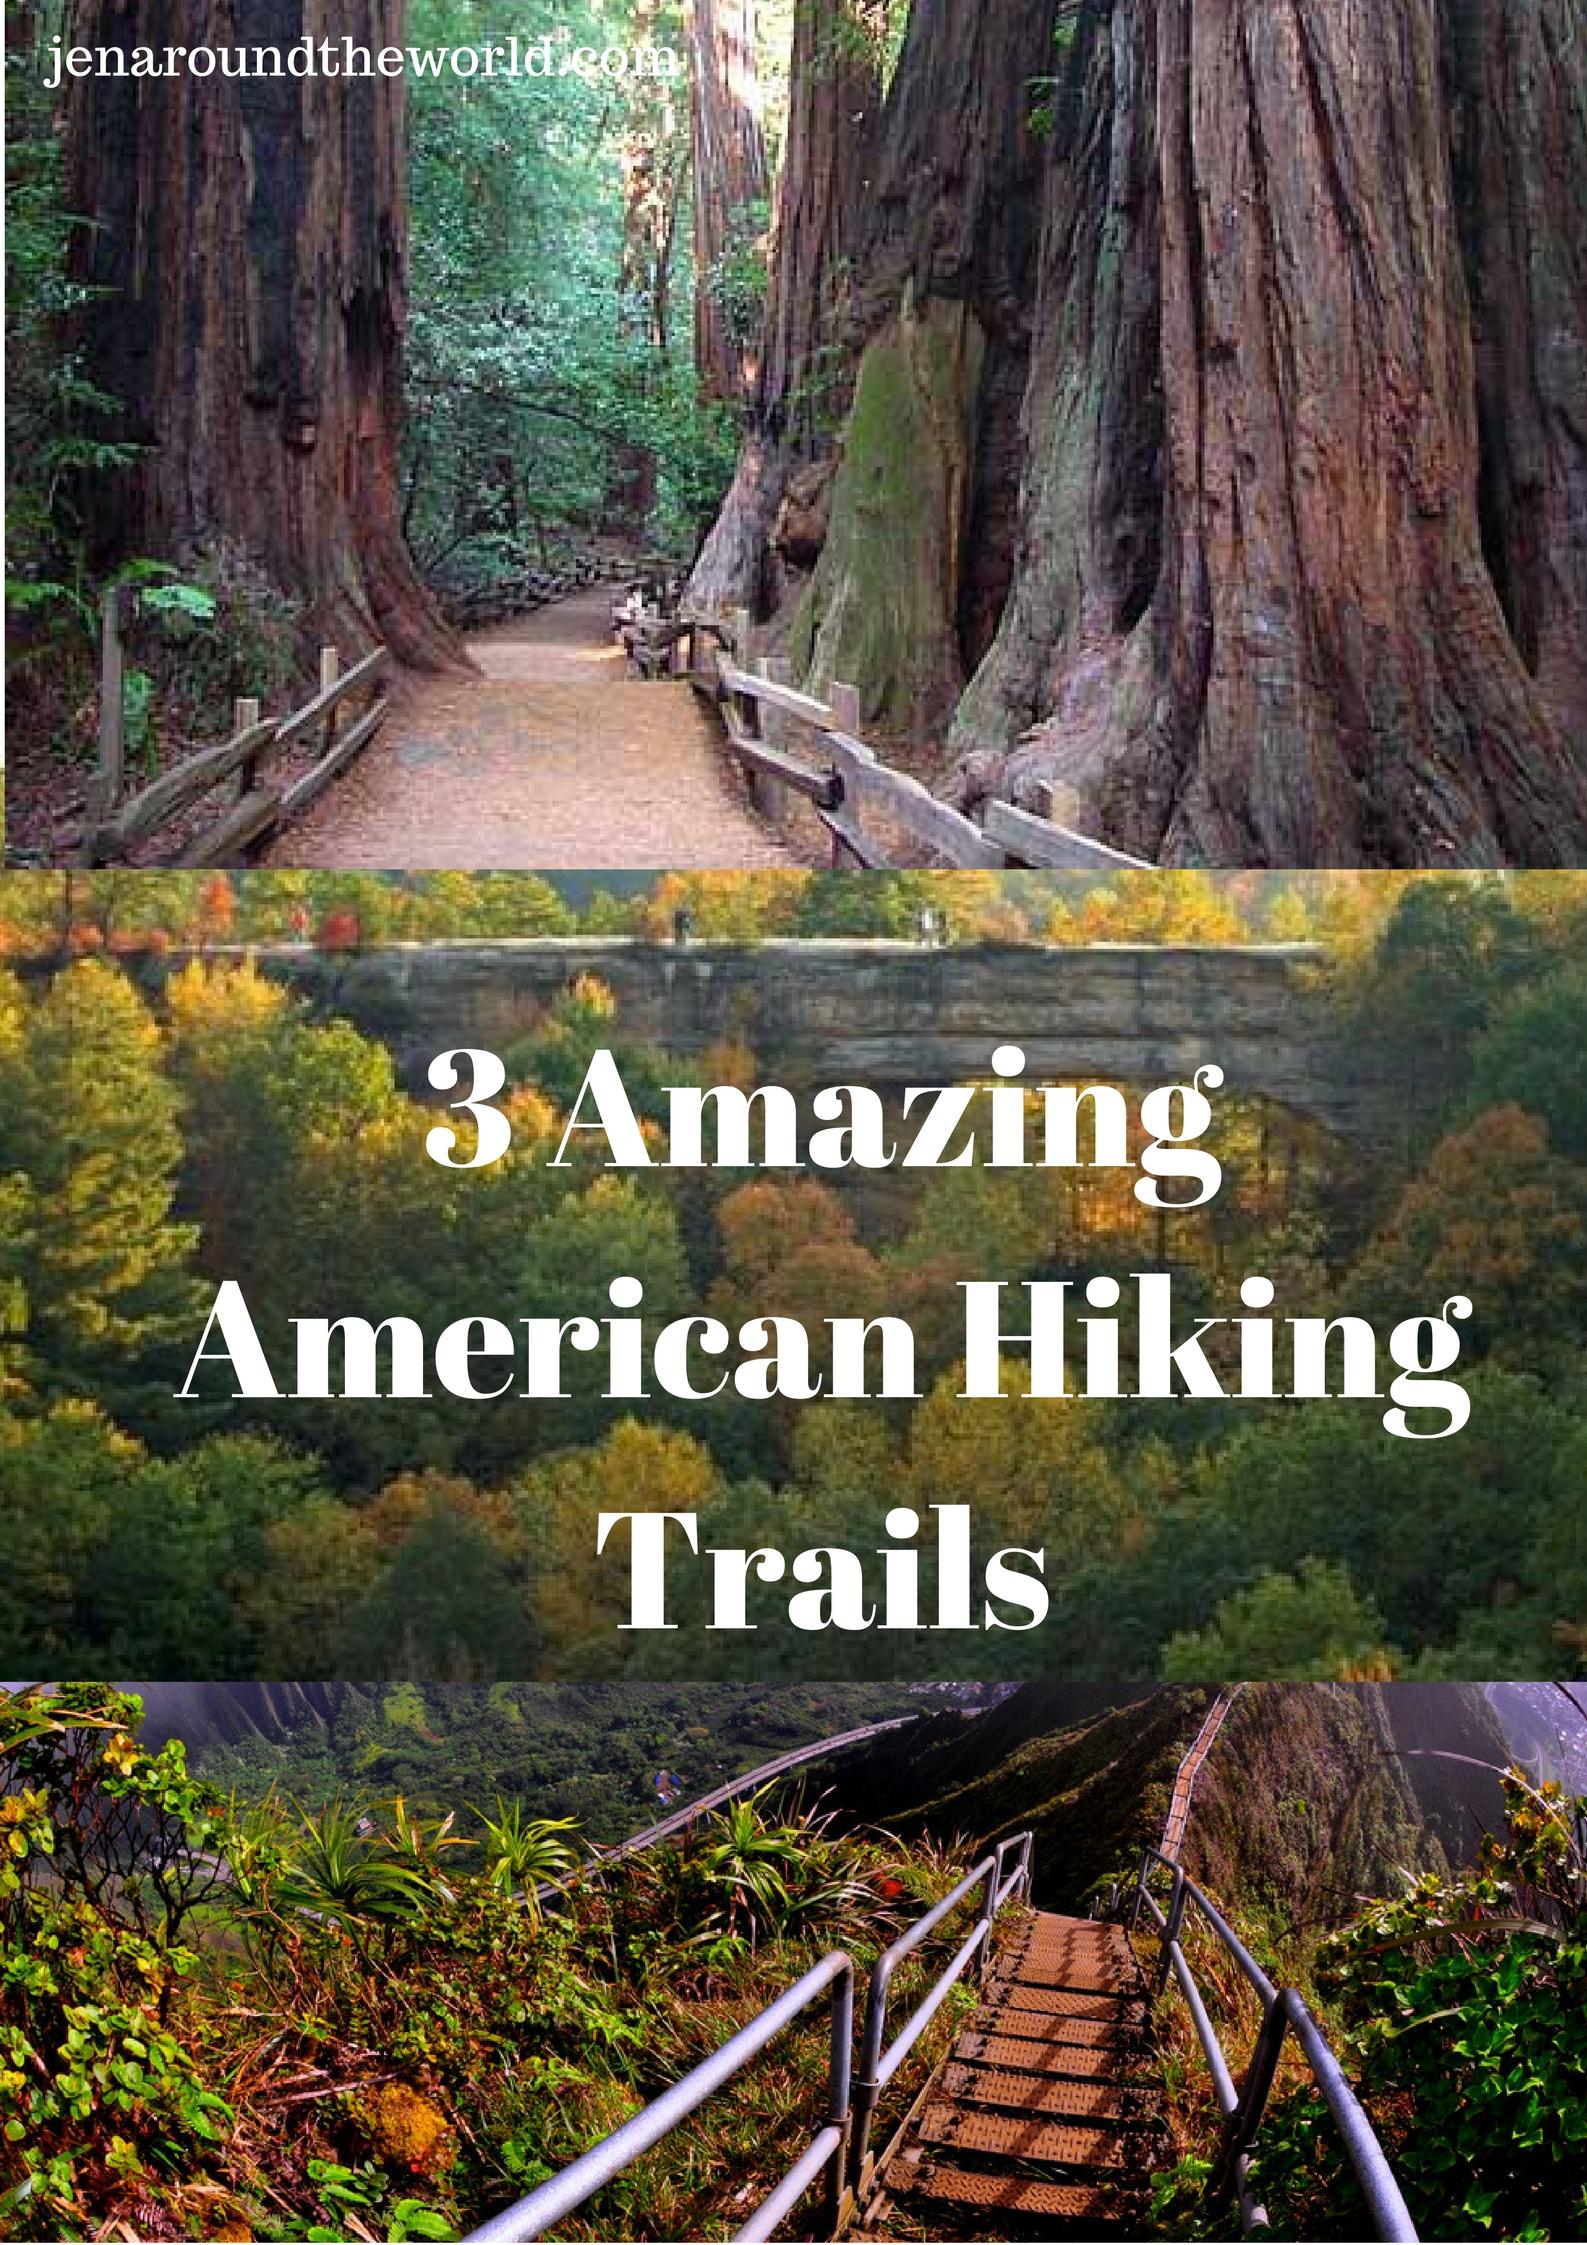 3 Amazing American Hiking Trails